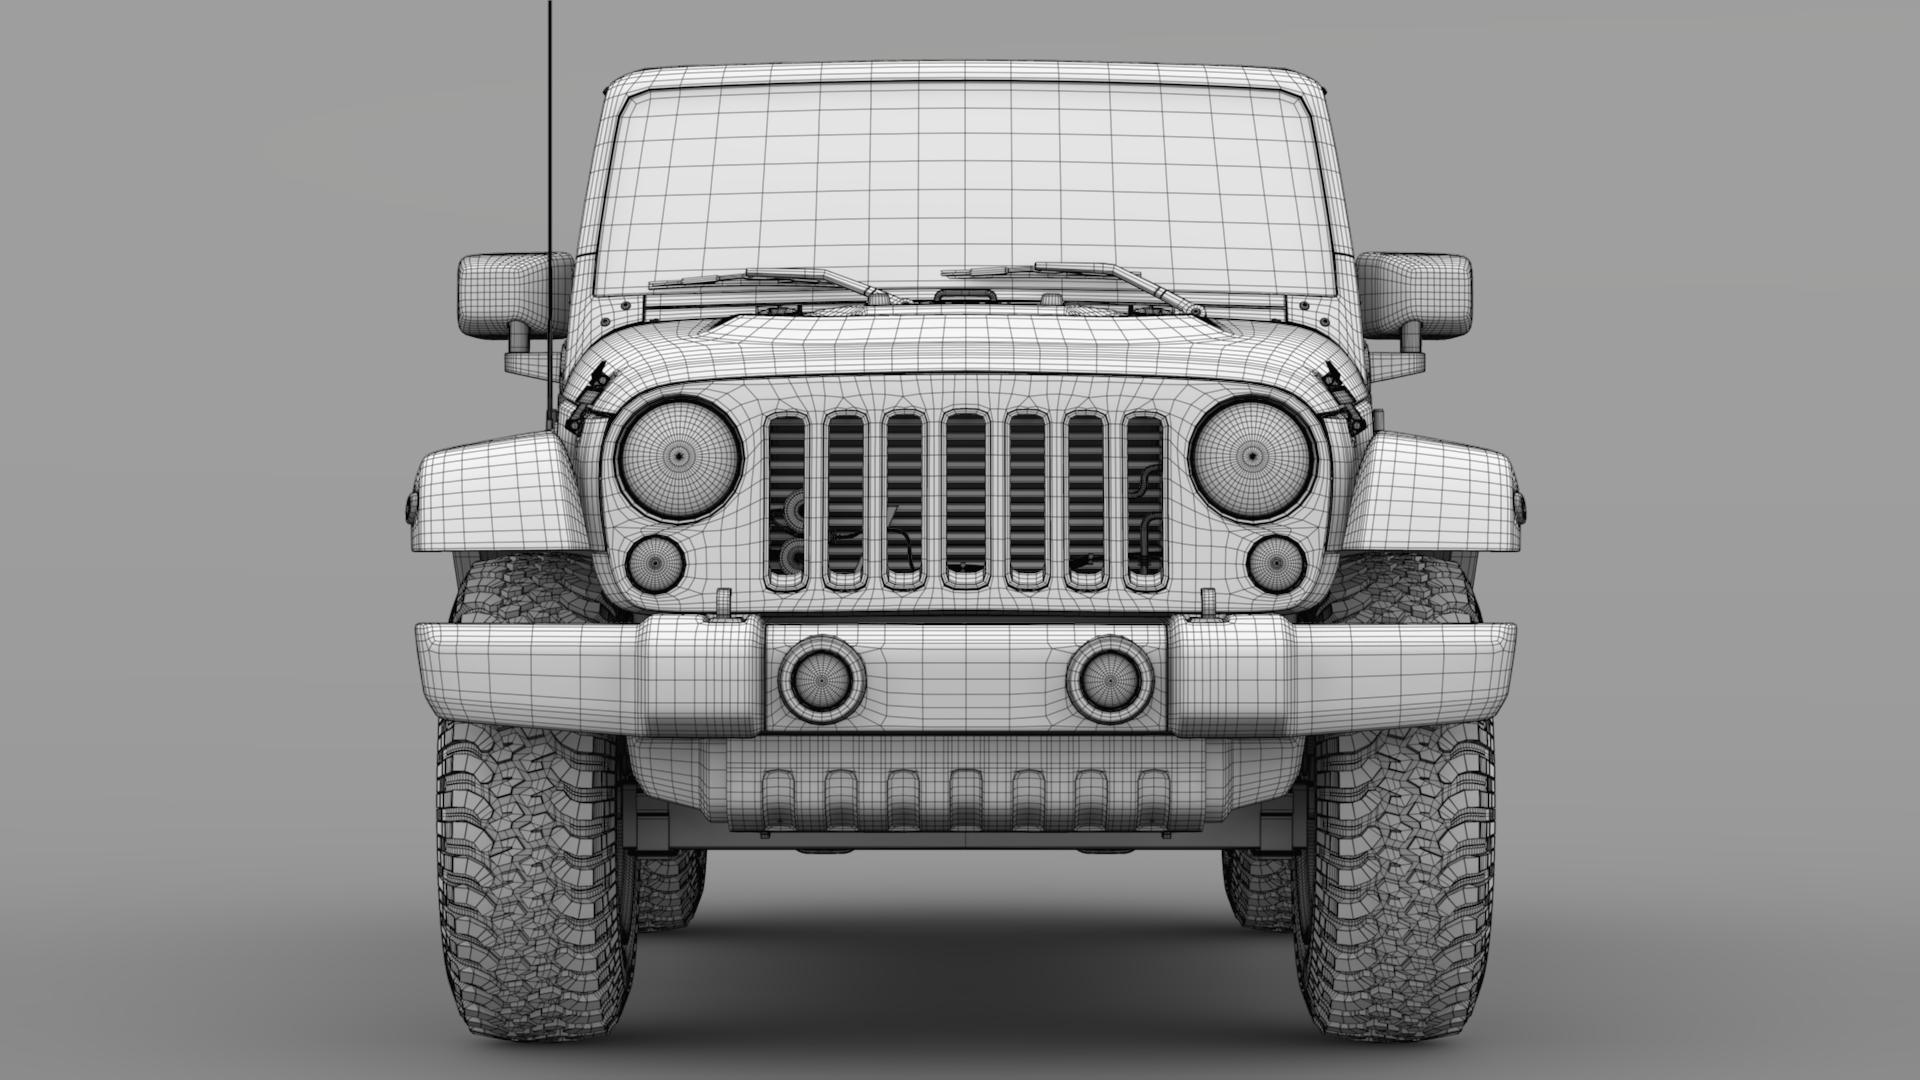 jeep wrangler chief jk 2017 3d model max fbx c4d lwo ma mb hrc xsi obj 276885